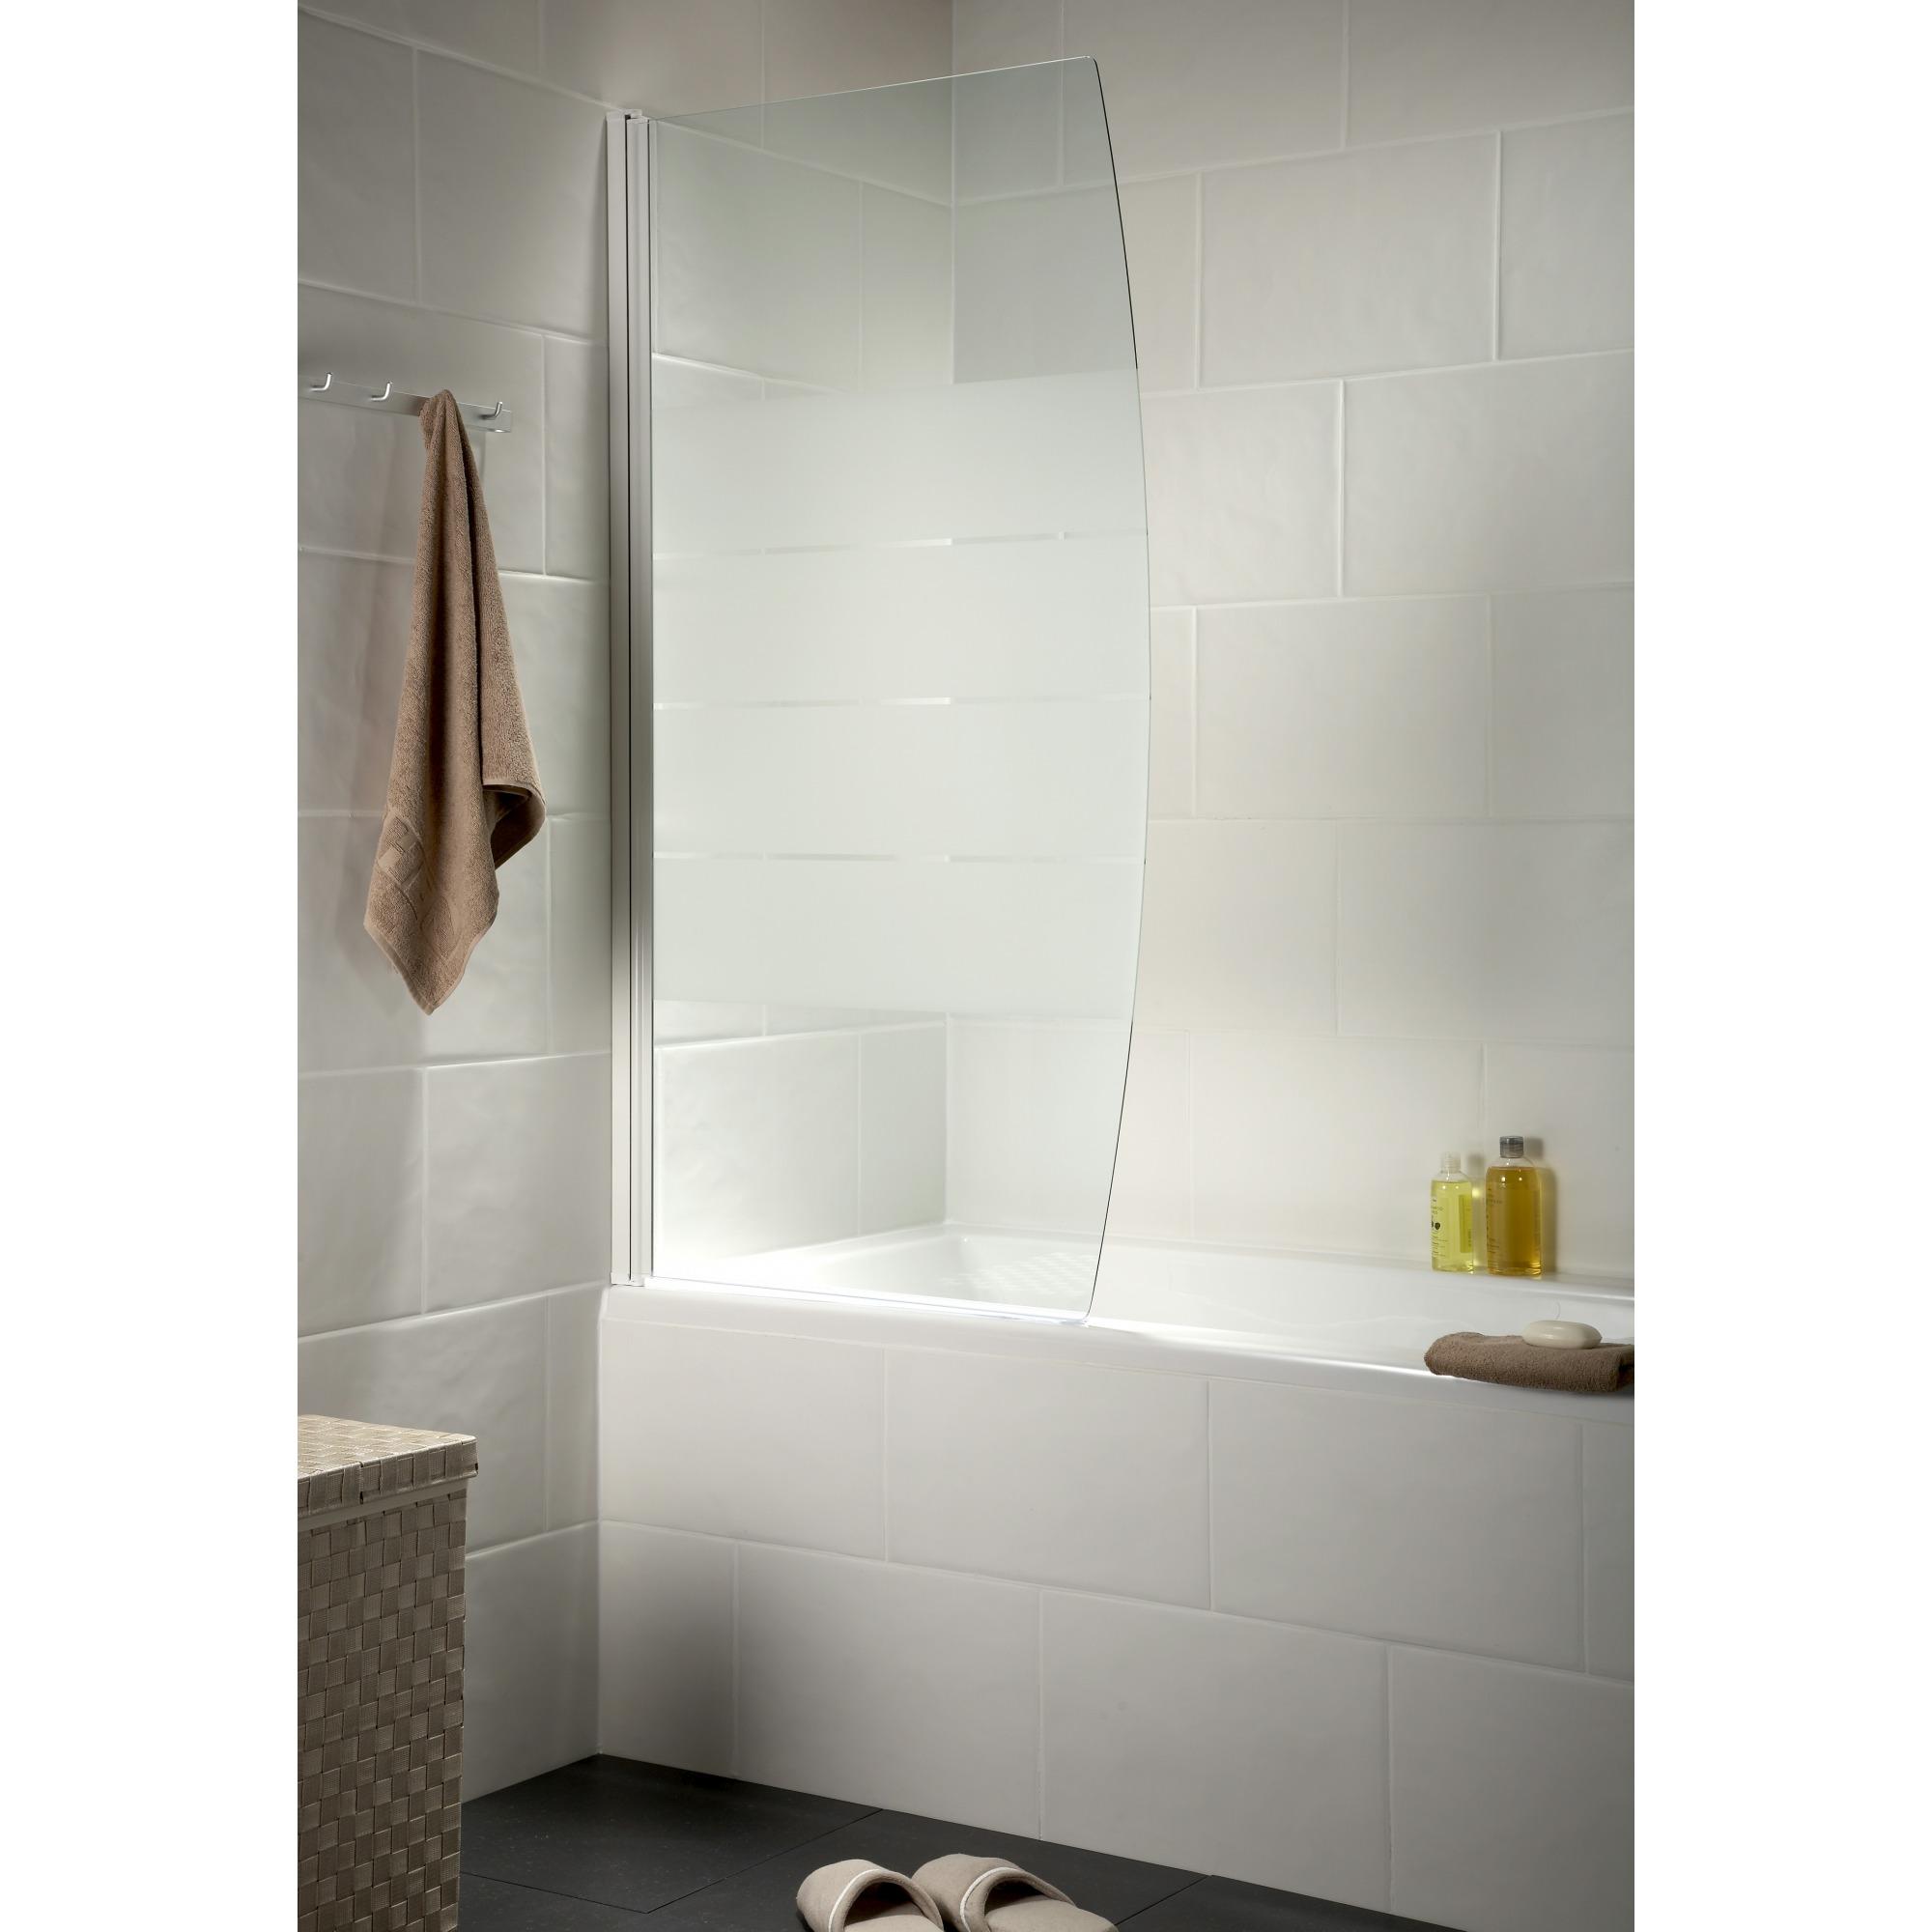 saniscape intense badwand wit 150x80 cm | douchecabines, deuren, Badkamer